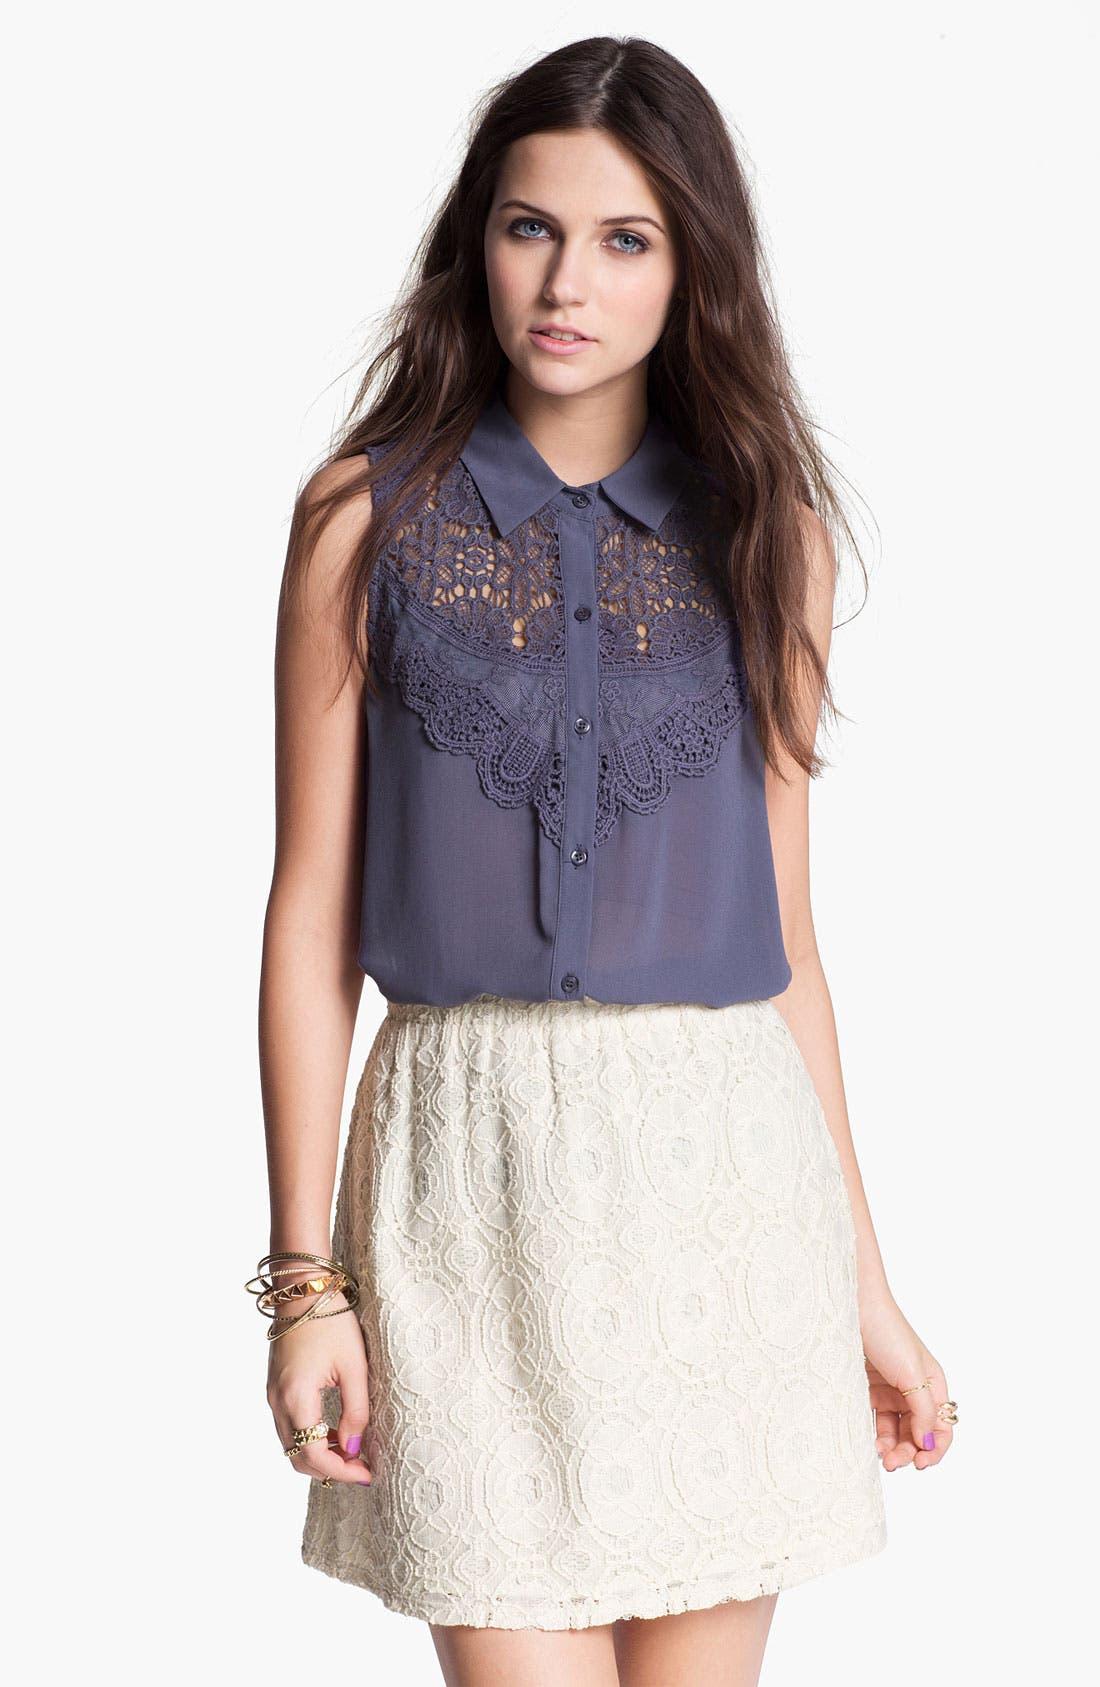 Alternate Image 1 Selected - Chloe K Lace Bib Sleeveless Shirt (Juniors)